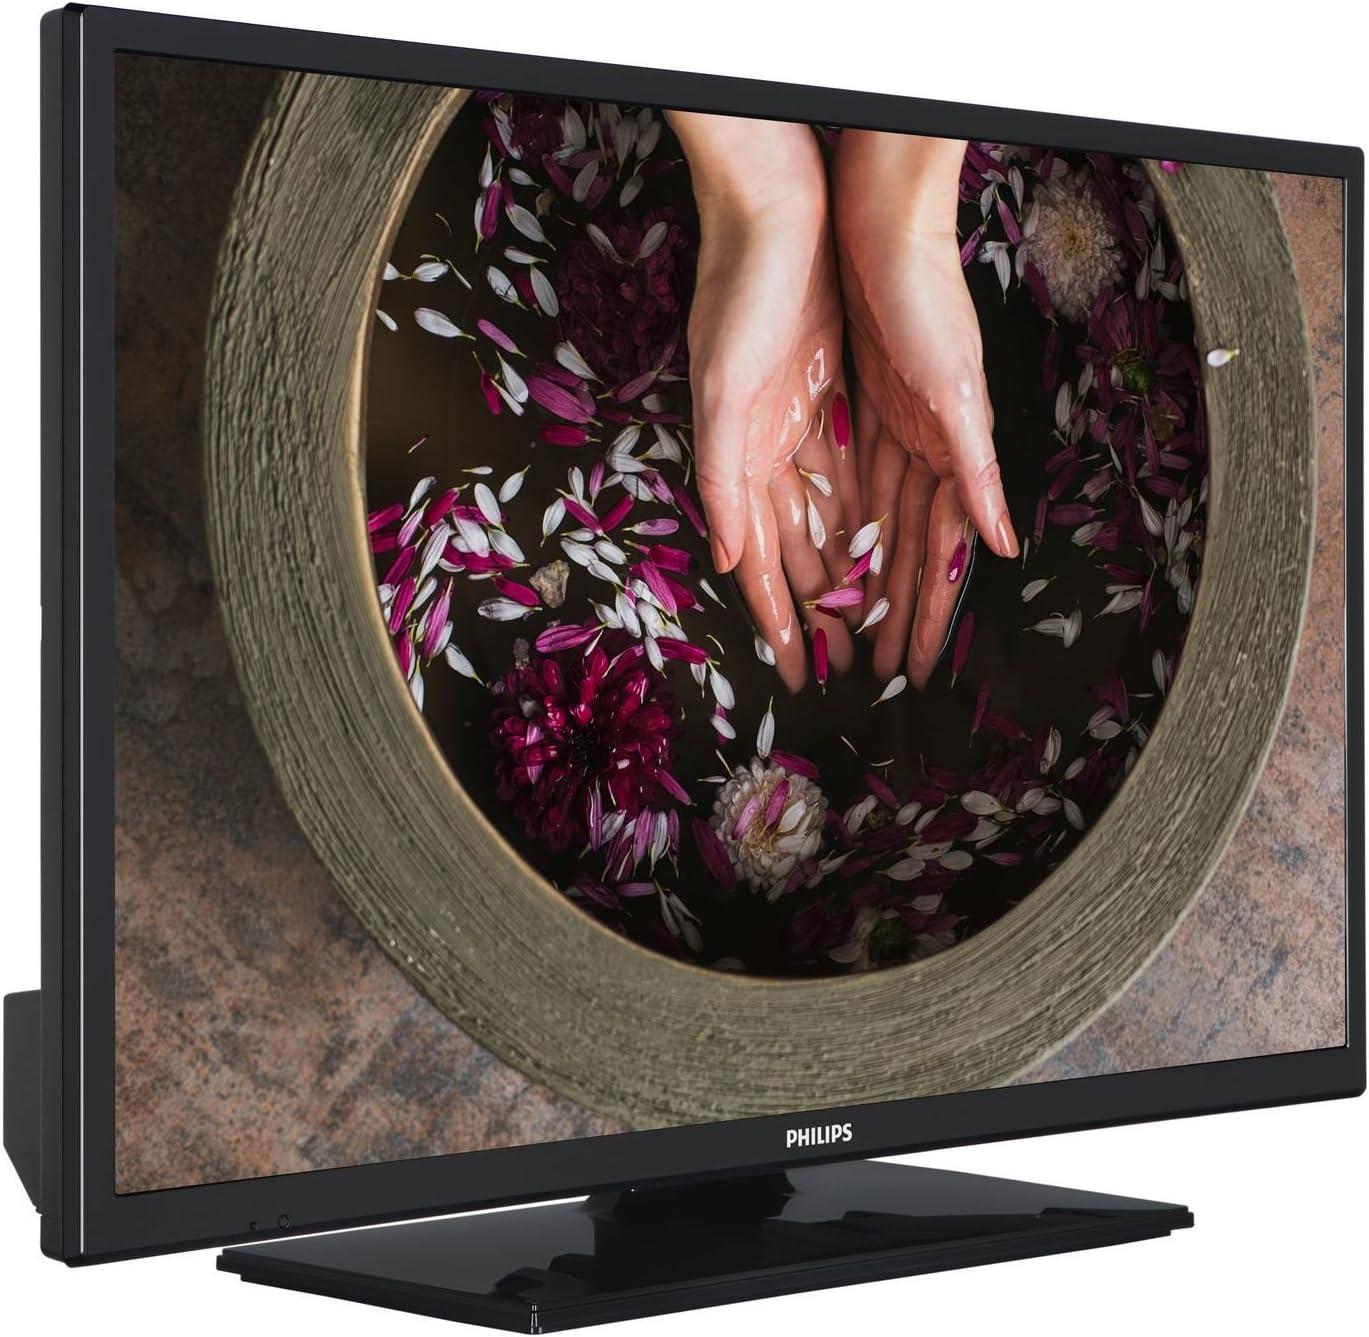 PHILIPS 32HFL2869T32 CLASEPROFESSIONAL Studio TV LEDHOTEL/Sector HOTELERO720P 1366 X 768NEGRO: Philips: Amazon.es: Electrónica